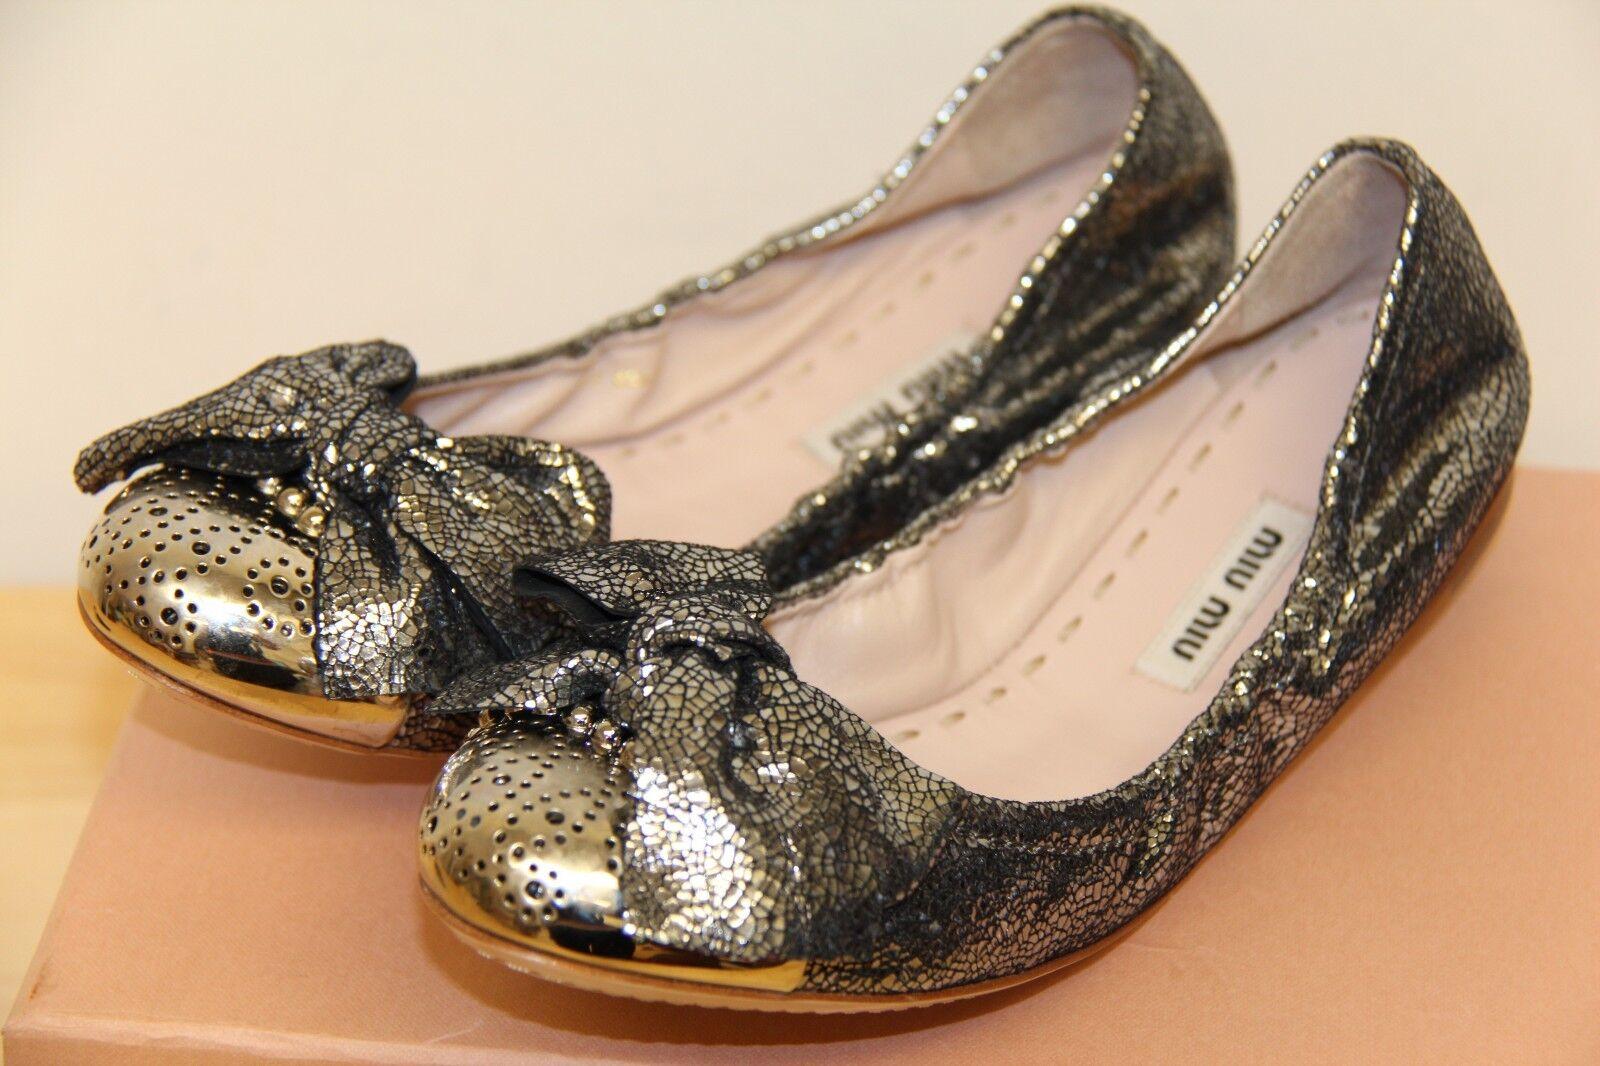 NIB MIU MIU Ballet Leather Flats chaussures argent 38.5  495 Cracle Nizza Piombo